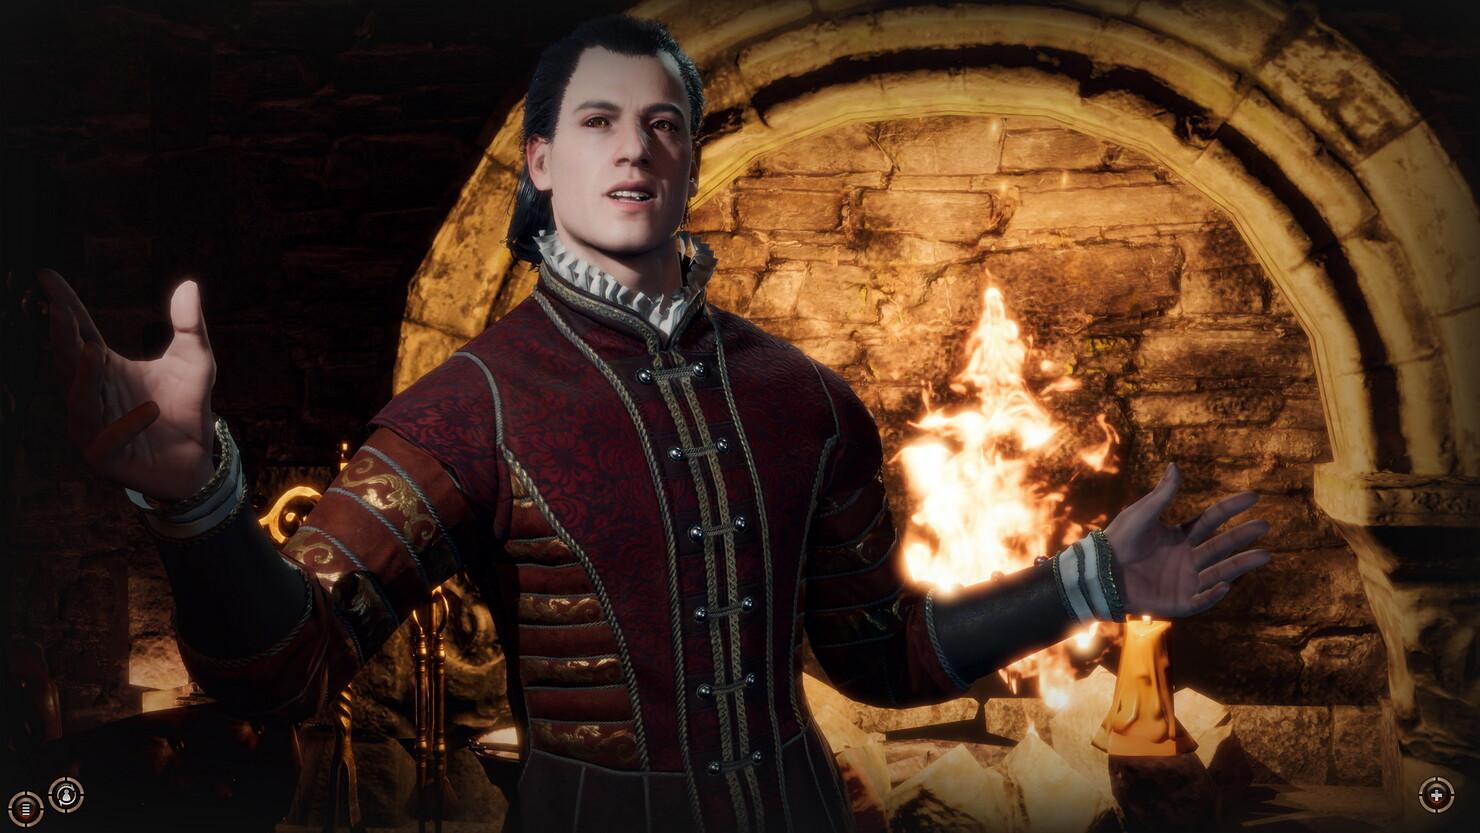 Кадры из игры Baldur's Gate III